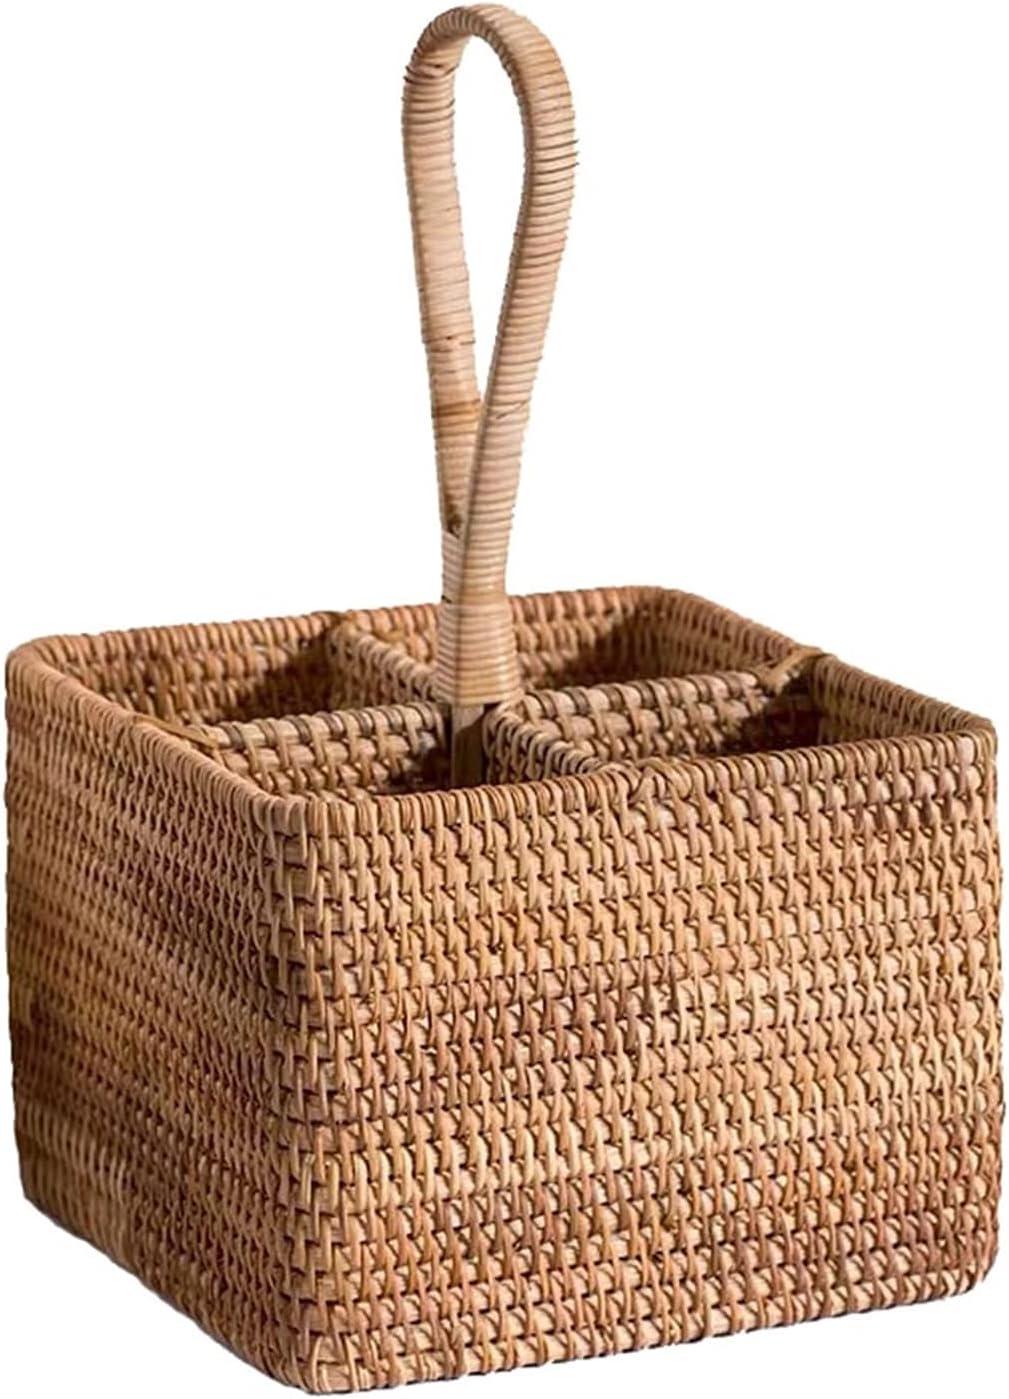 Low price Rattan Storage Baskets Handmade Desktop t Wholesale Used